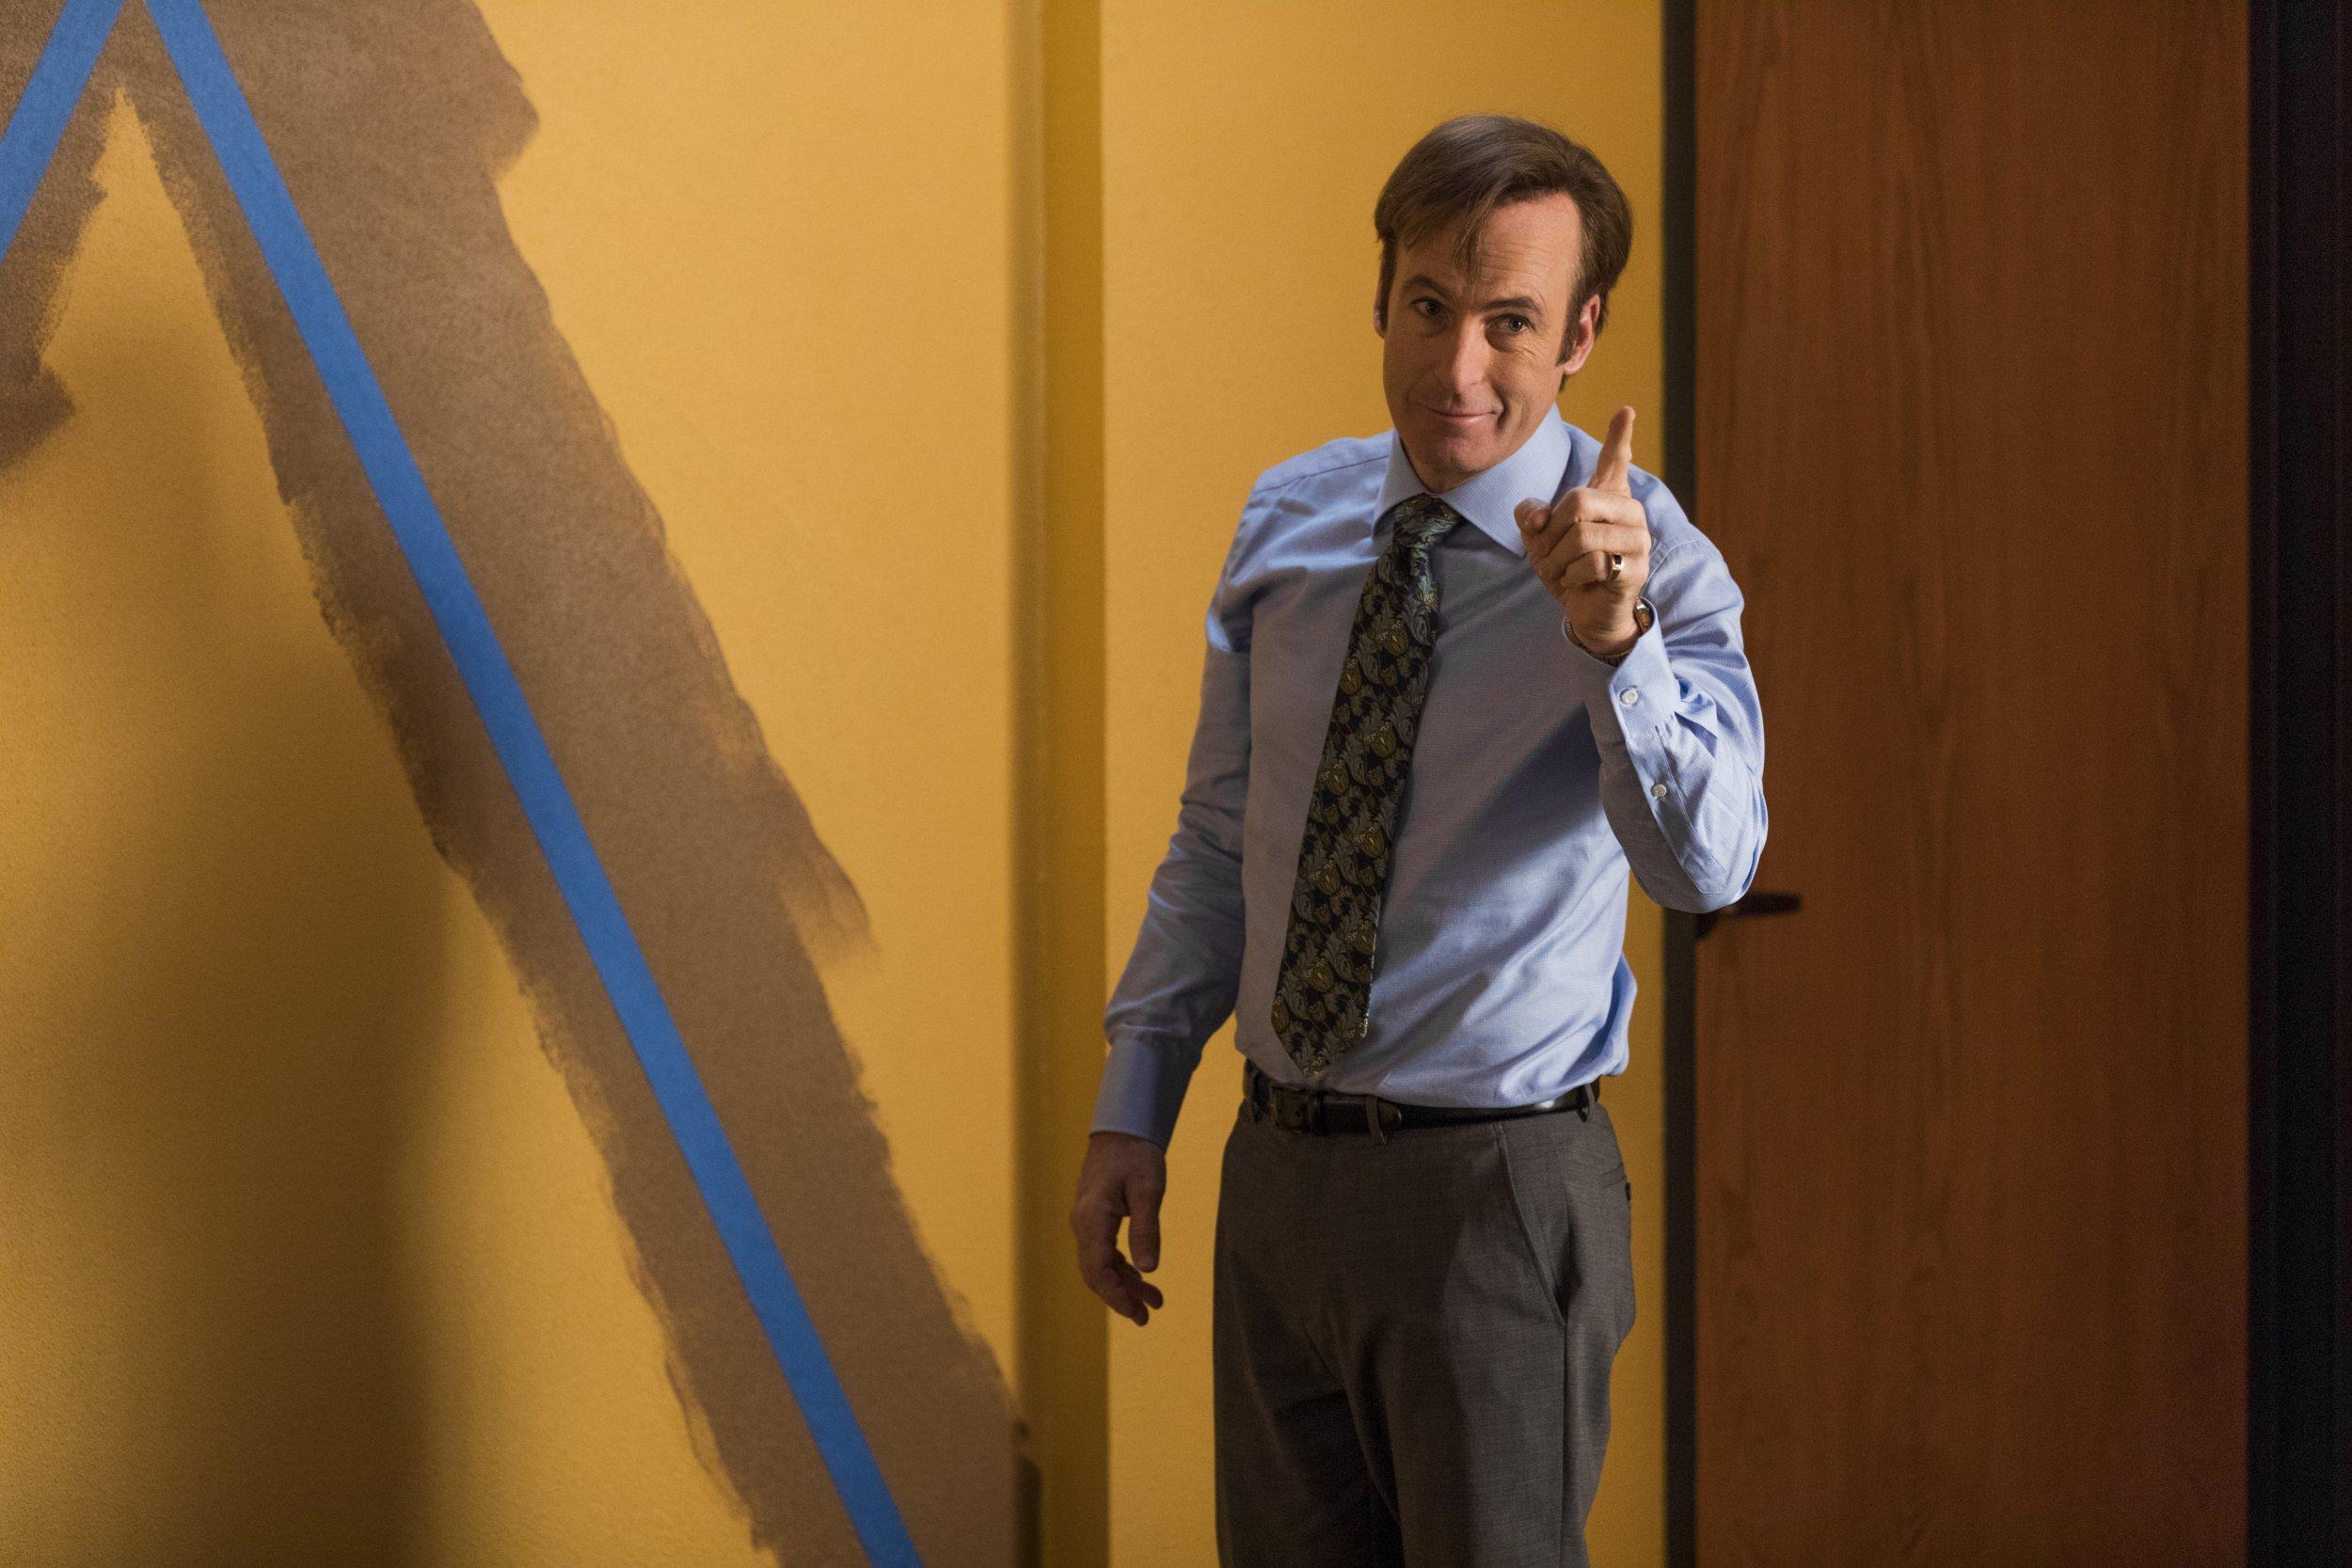 Better Call Saul Season 3 Episode 302